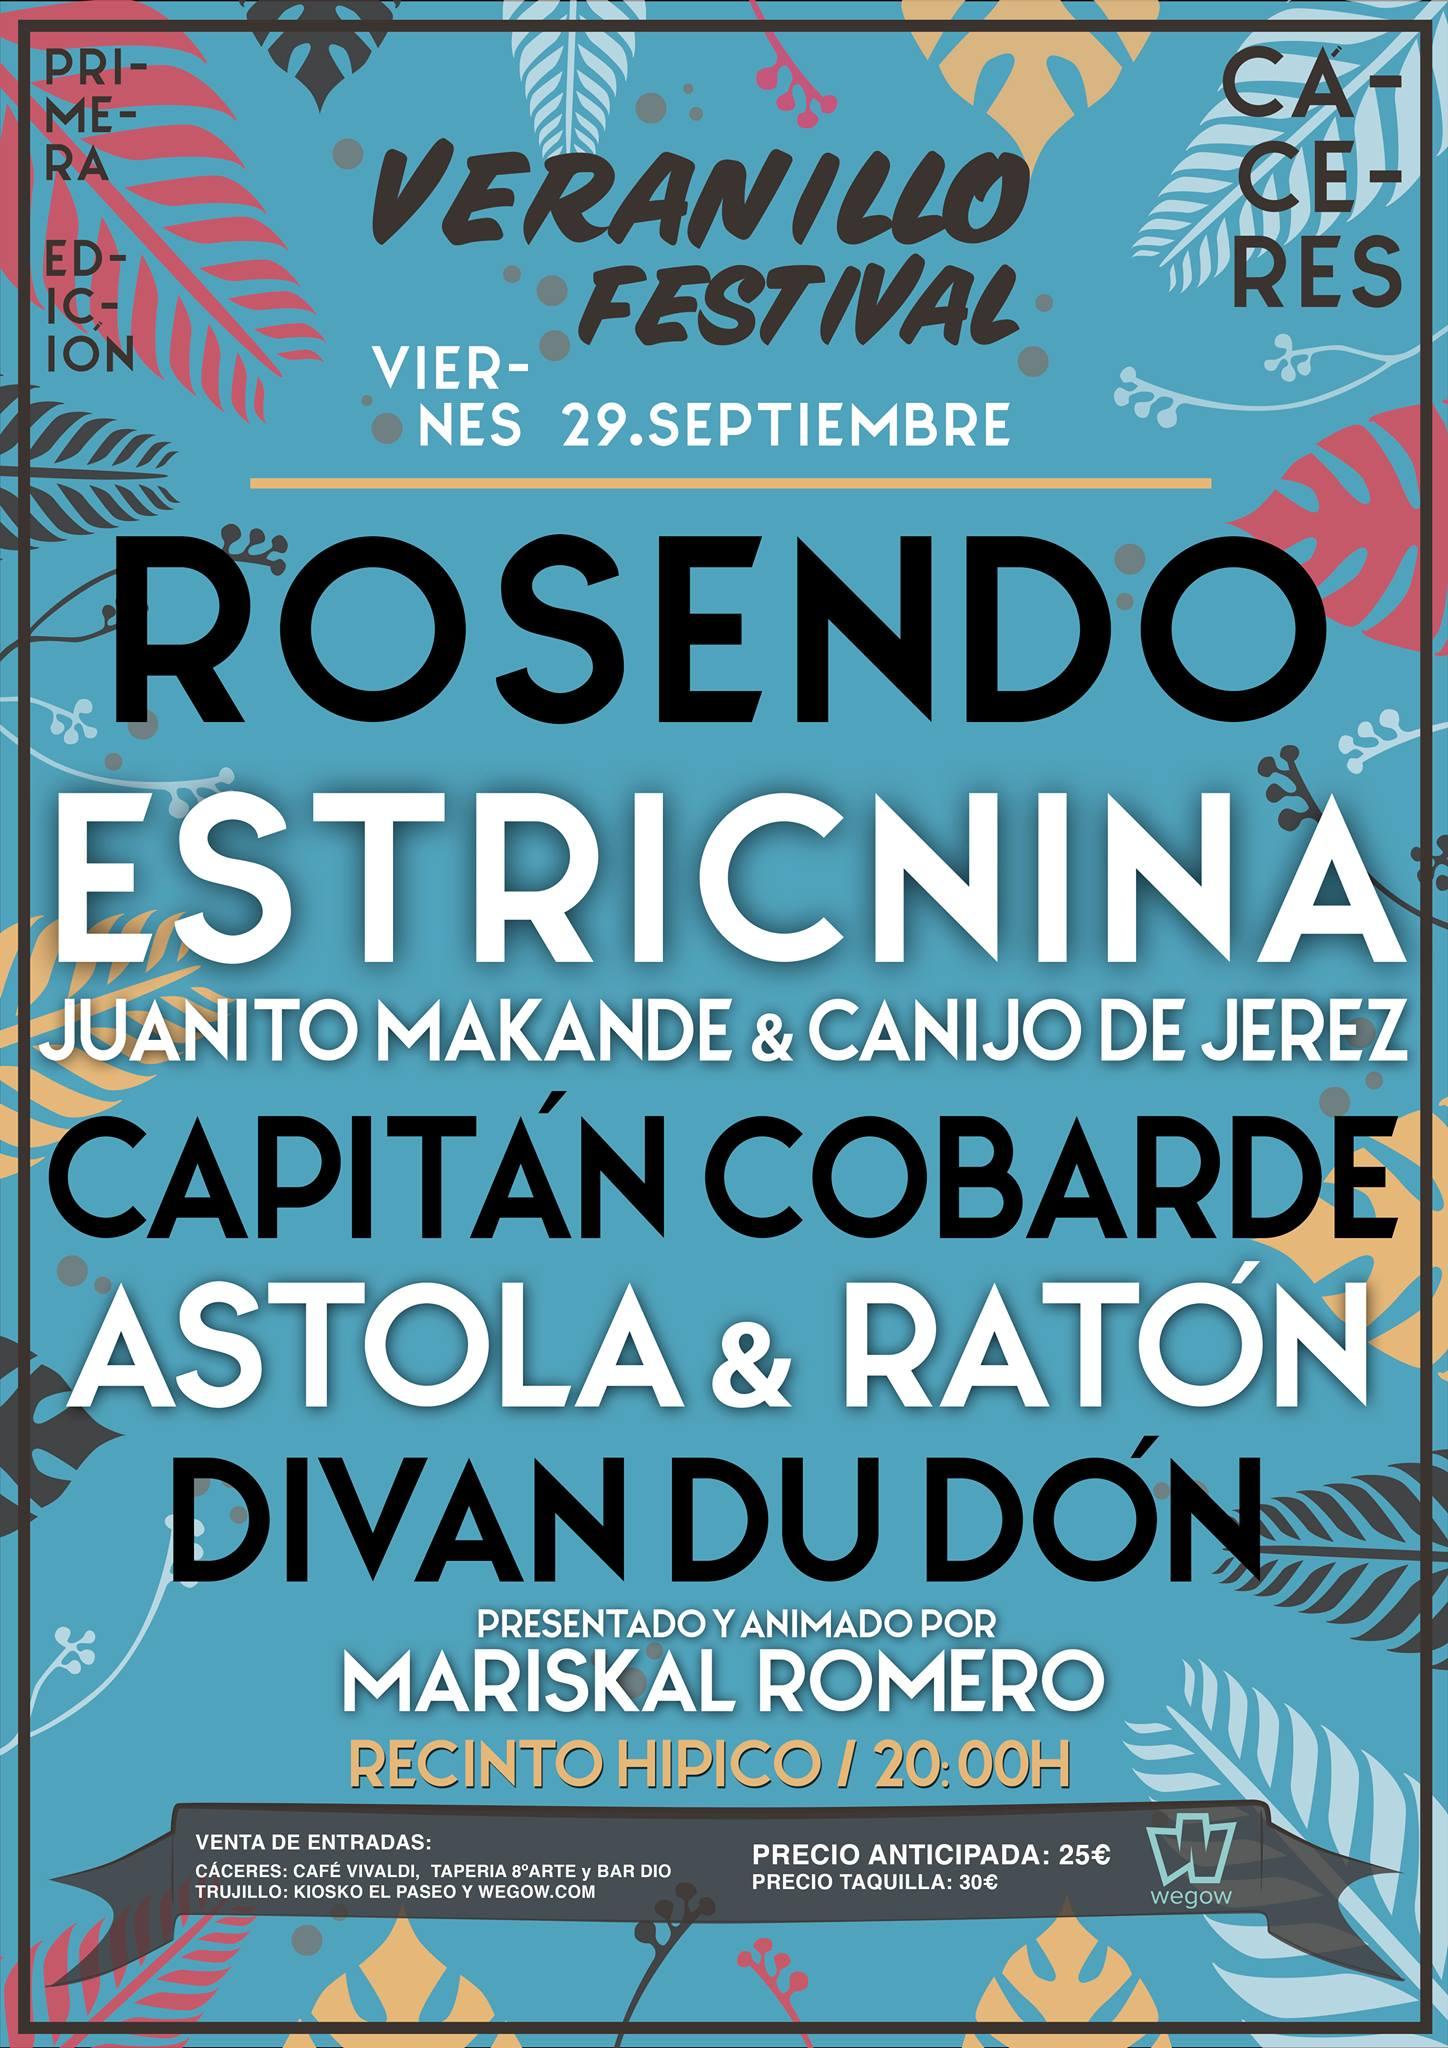 0239be7a313d VERANILLO FESTIVAL - CÁCERES - Capitan Cobarde - Página Oficial